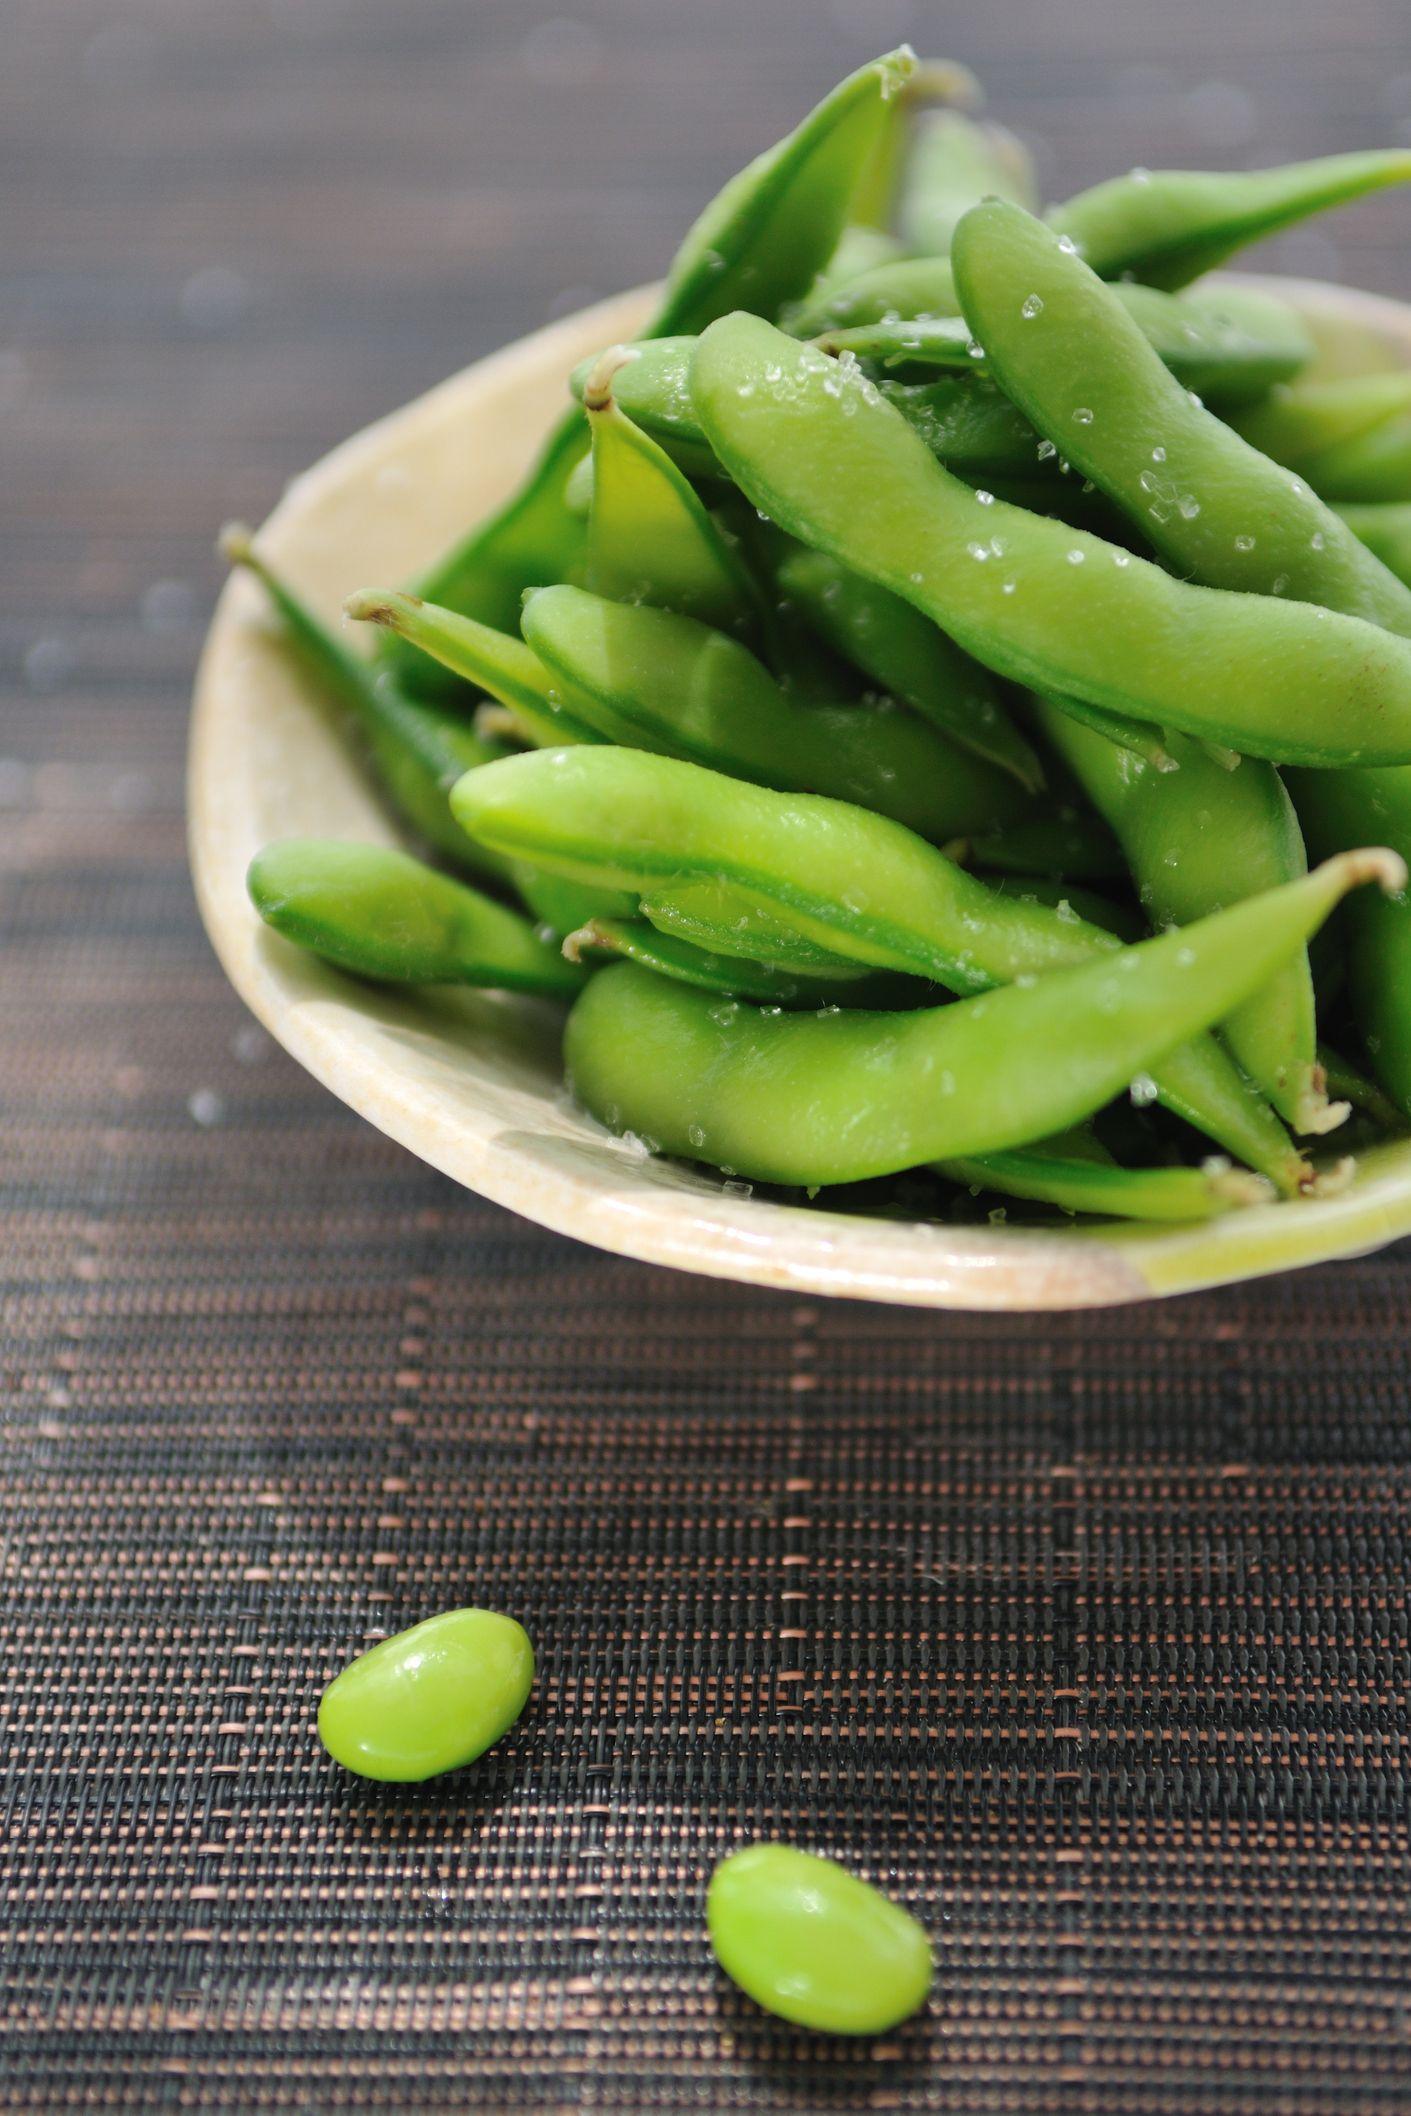 Bowl of edamame beans on bamboo mat